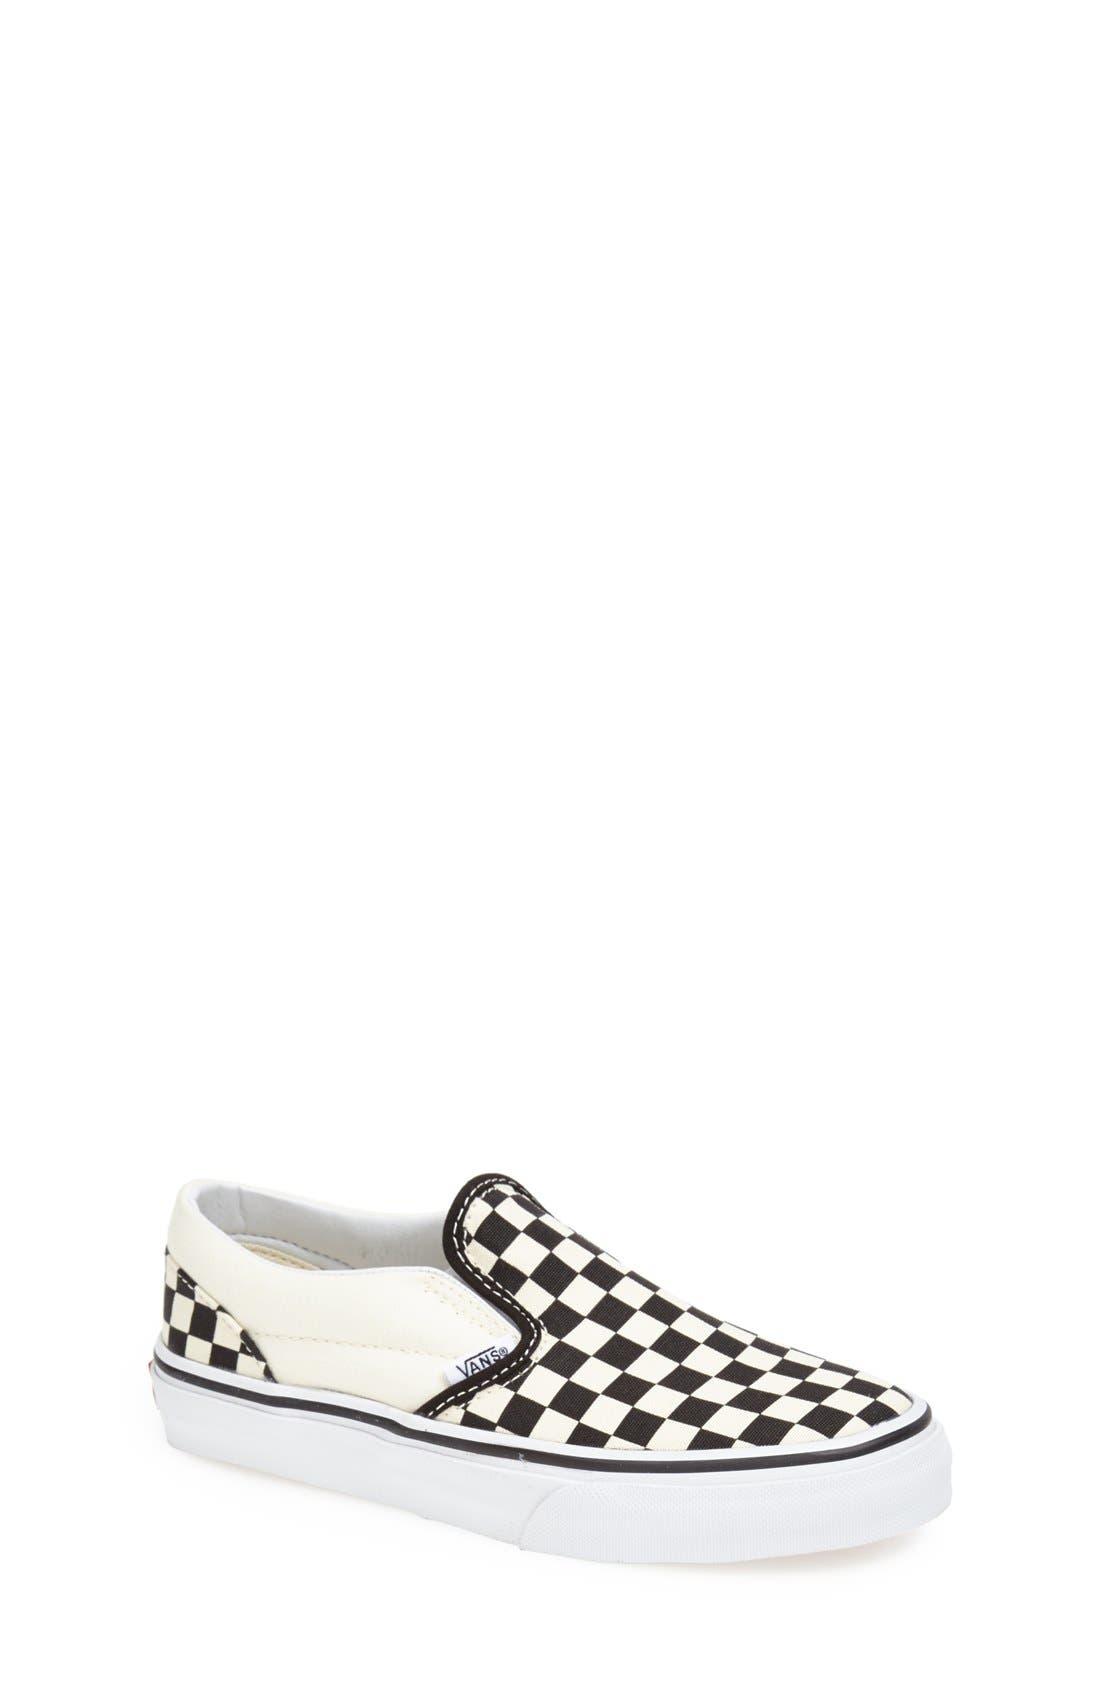 Toddler Boys Vans Classic  Checkerboard SlipOn Size 95 M  Black